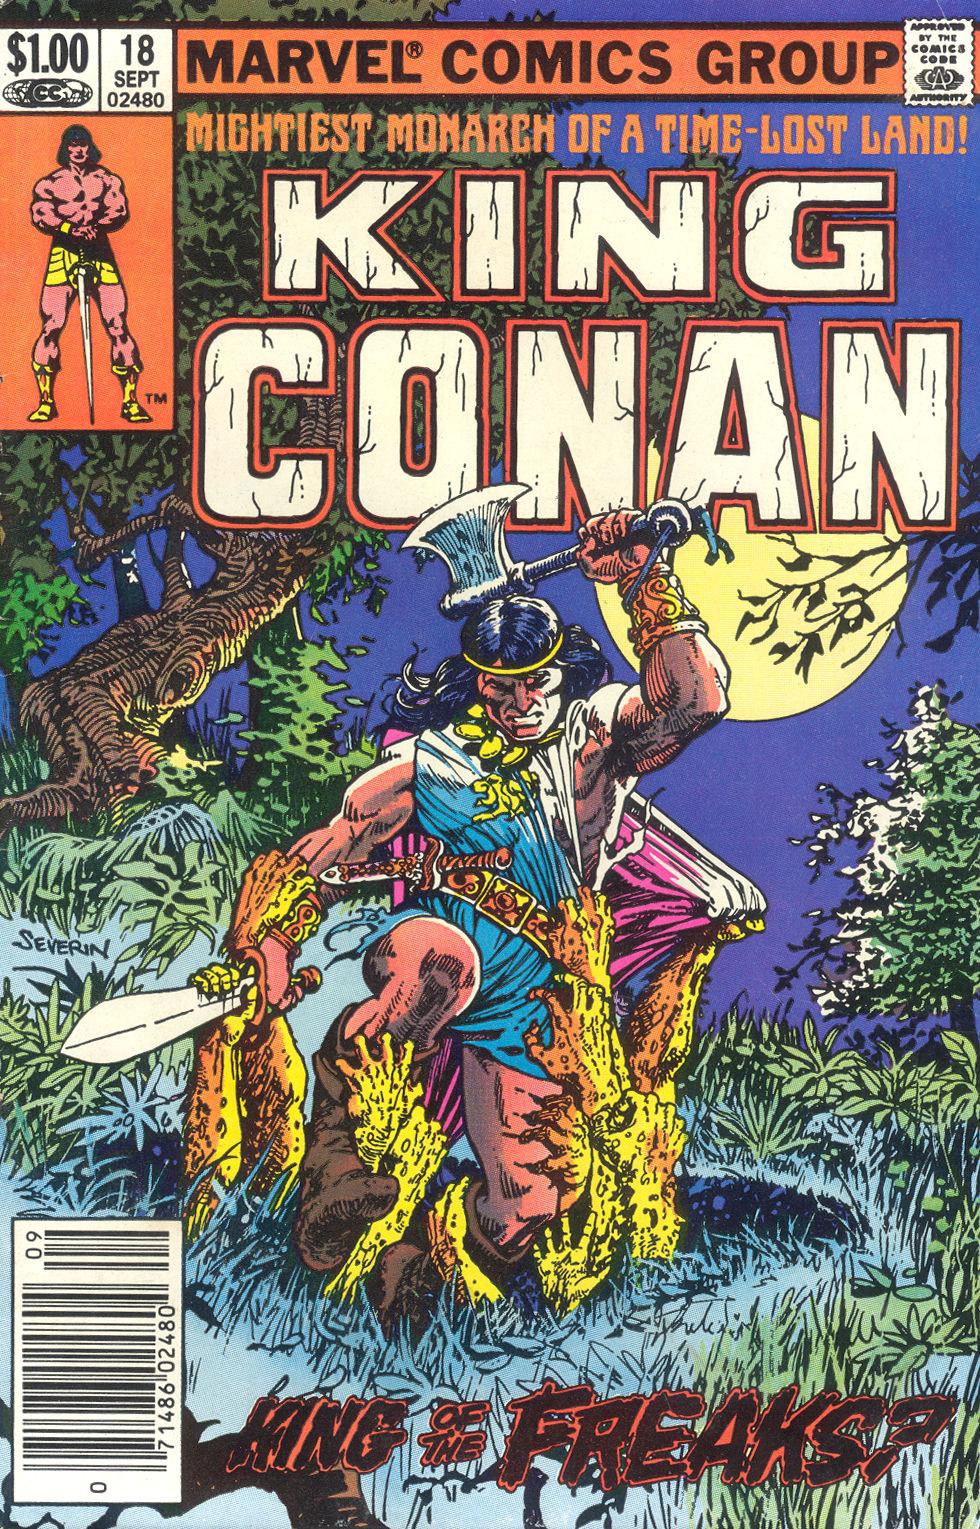 King Conan (1980) #18, cover by John Severin.